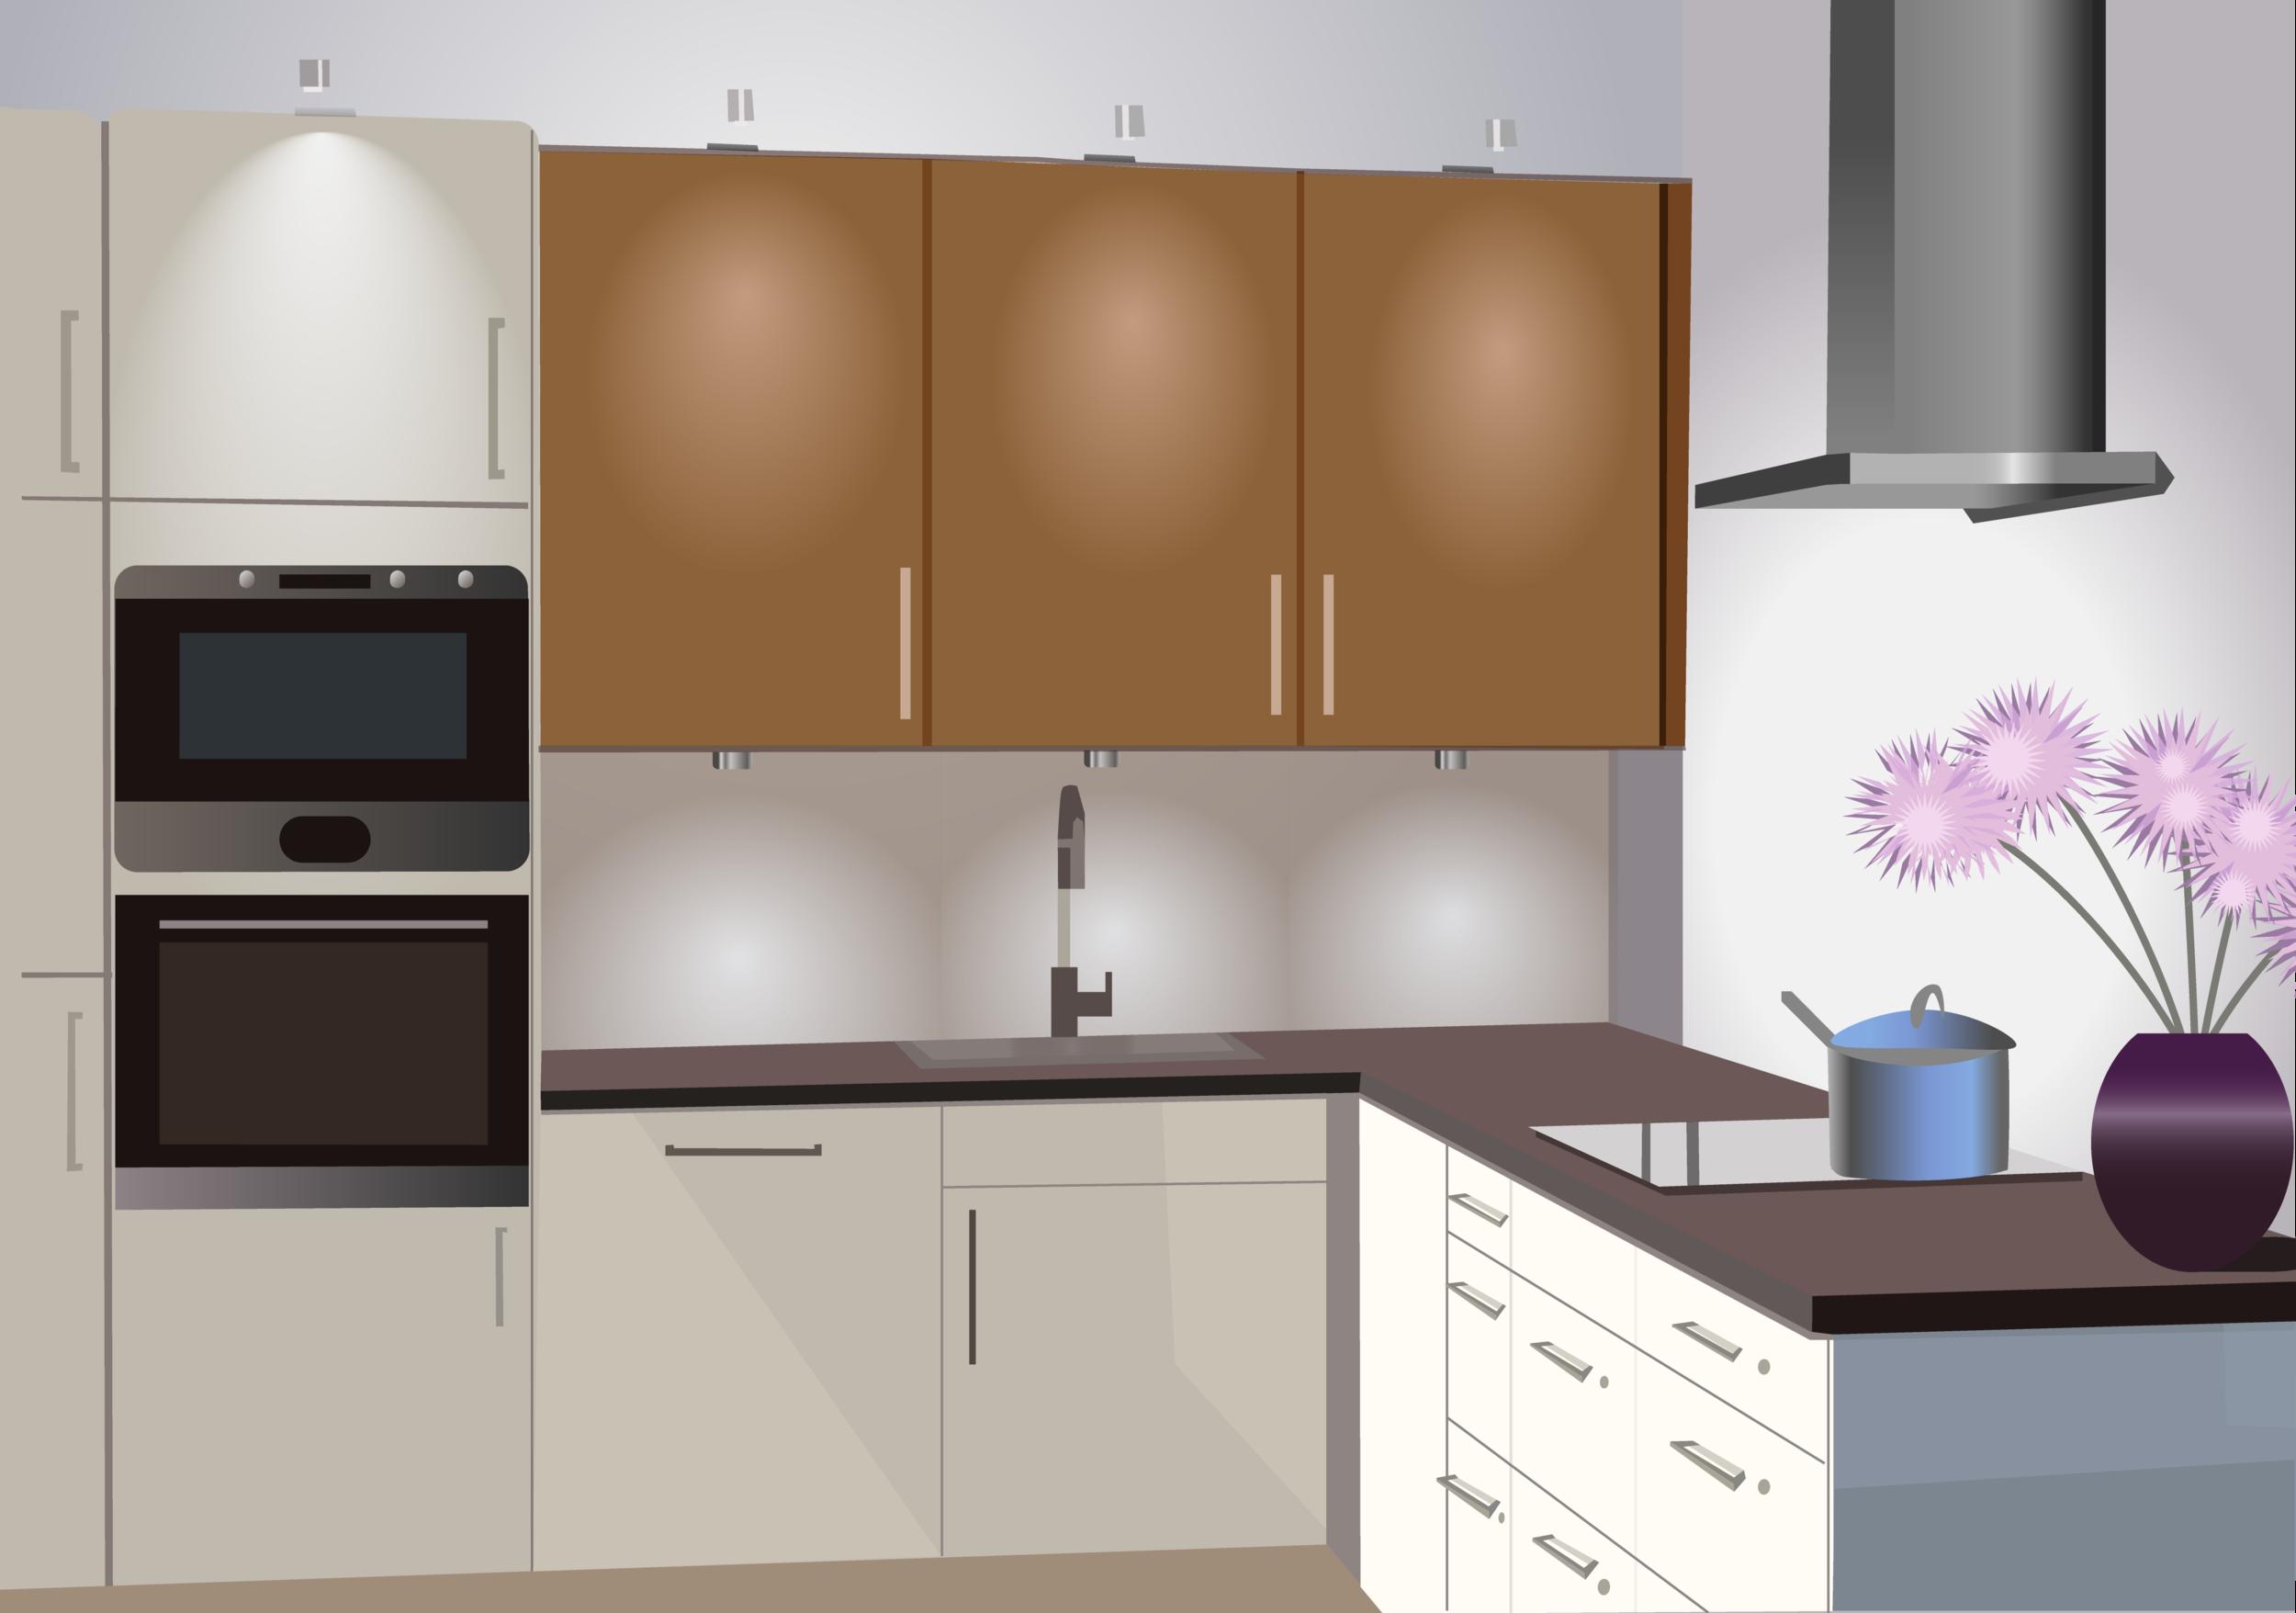 art_kitchen.png